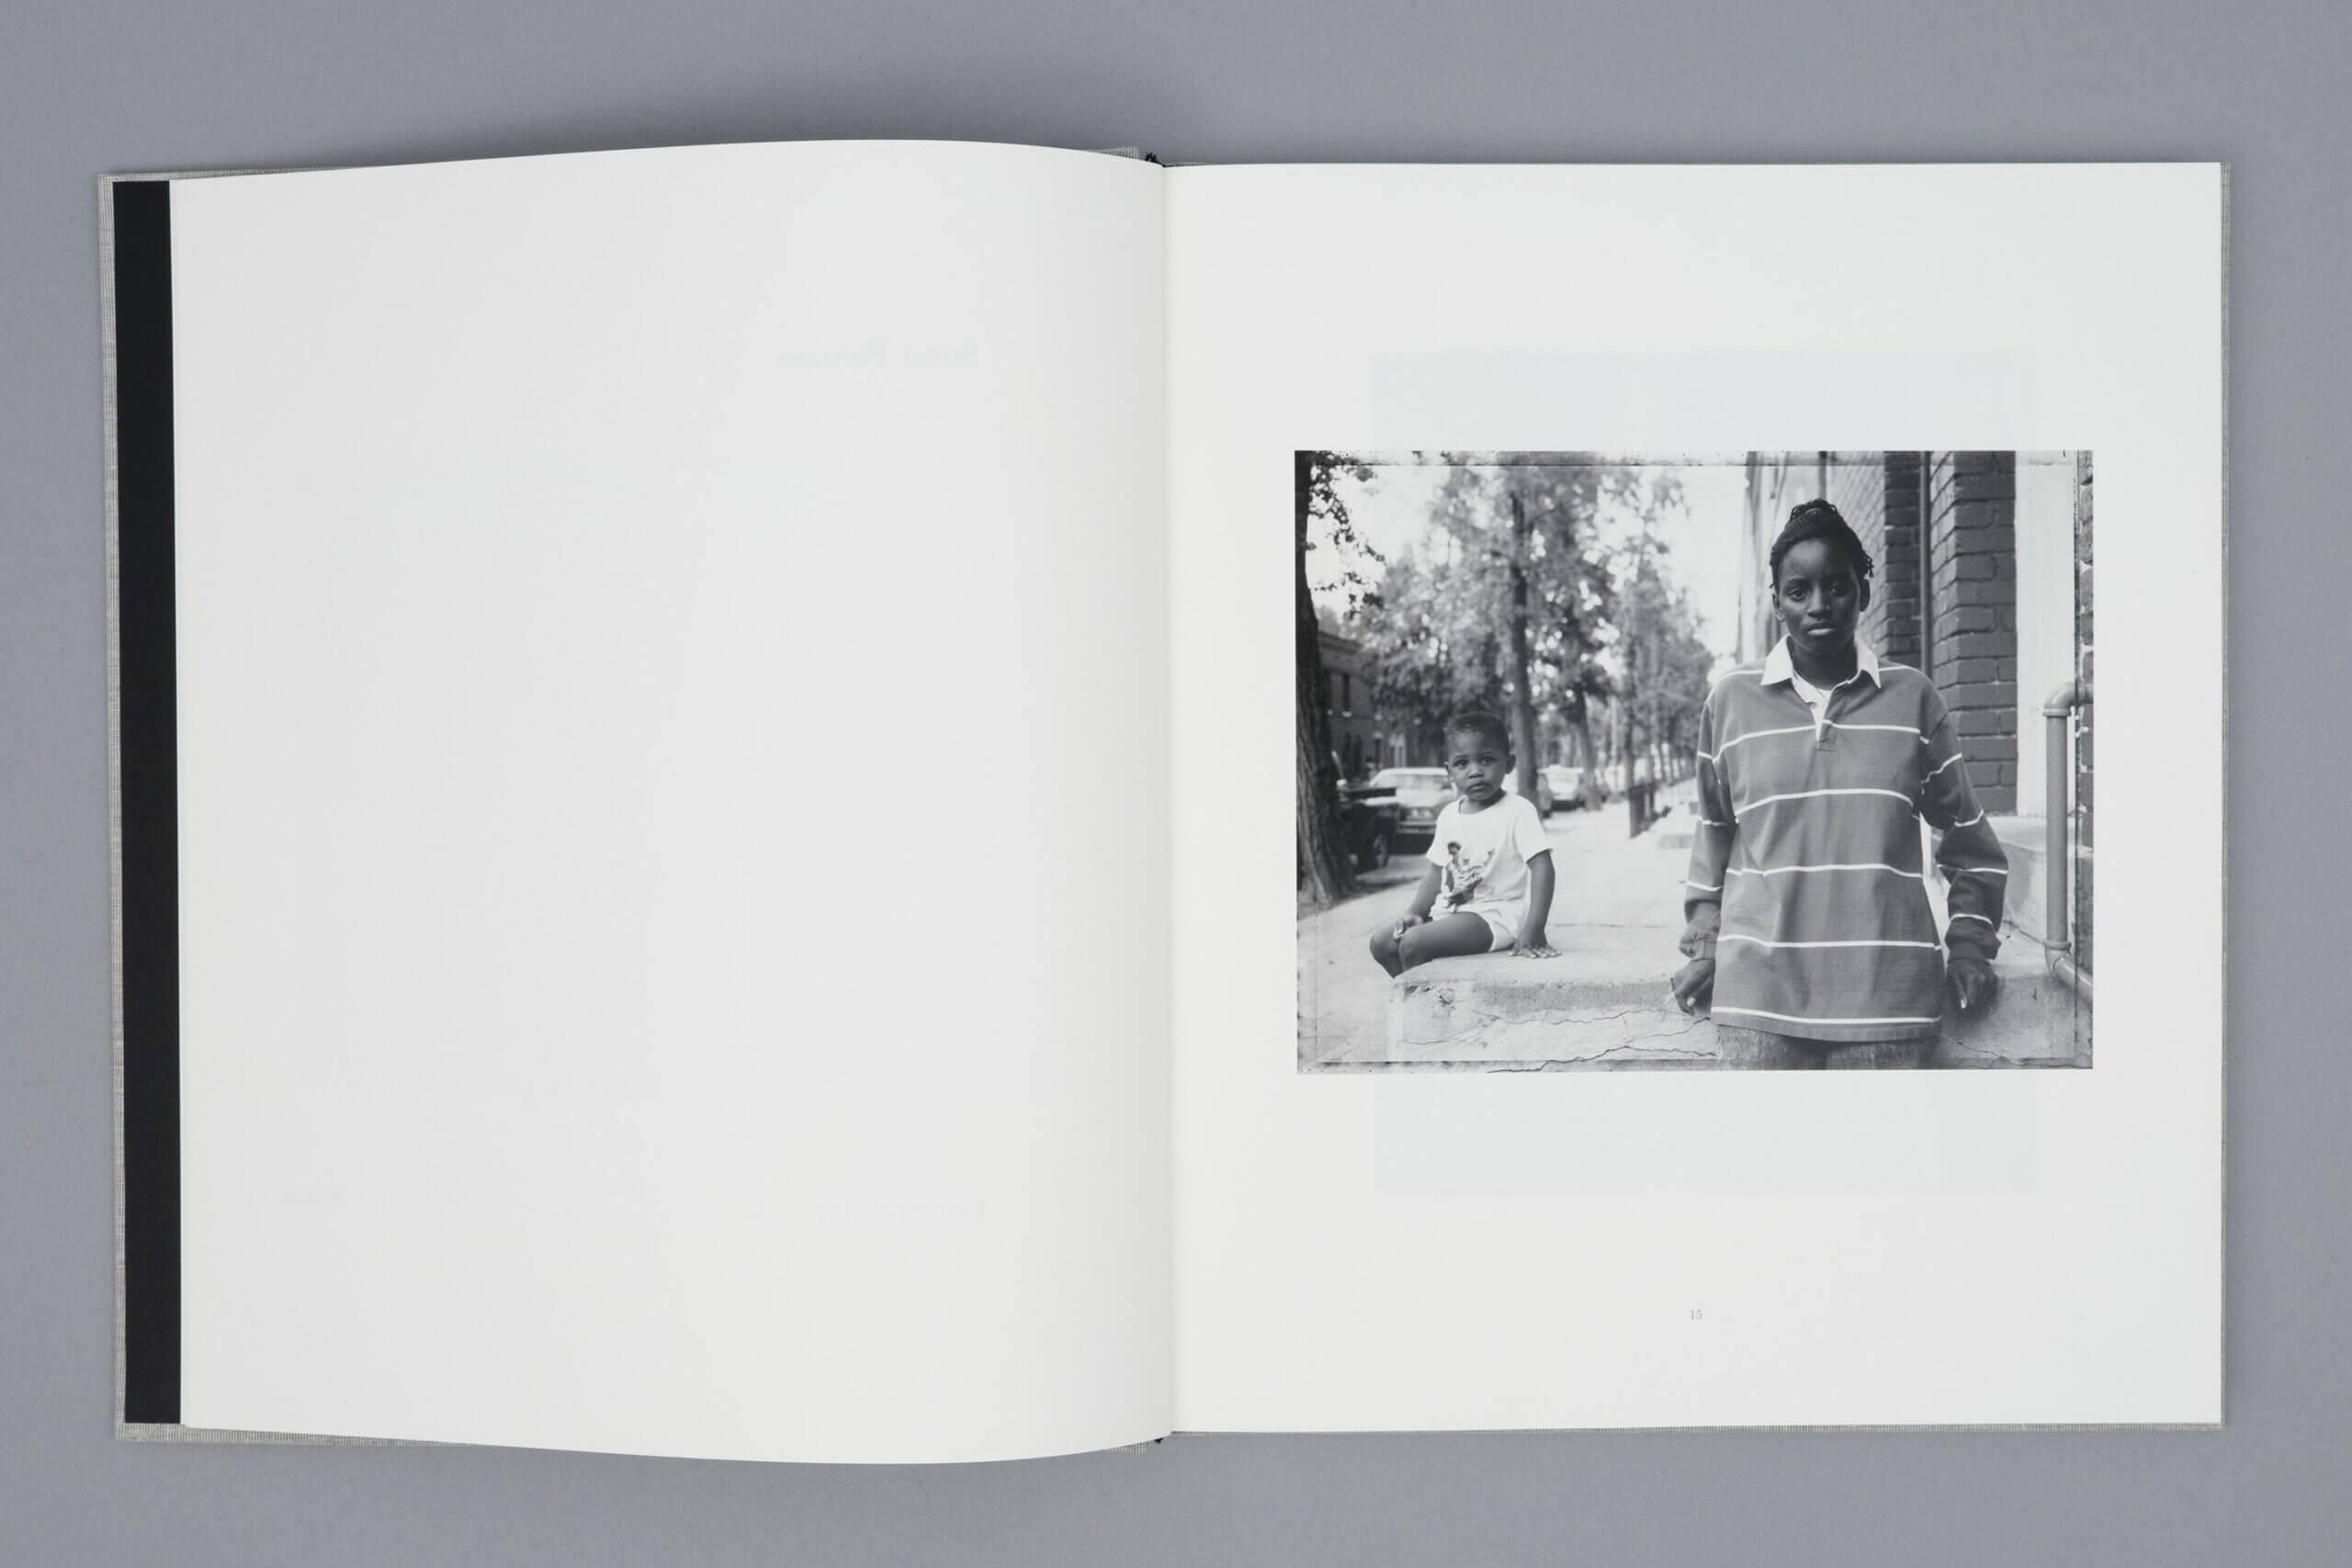 daoud-bey-street-portraits-5